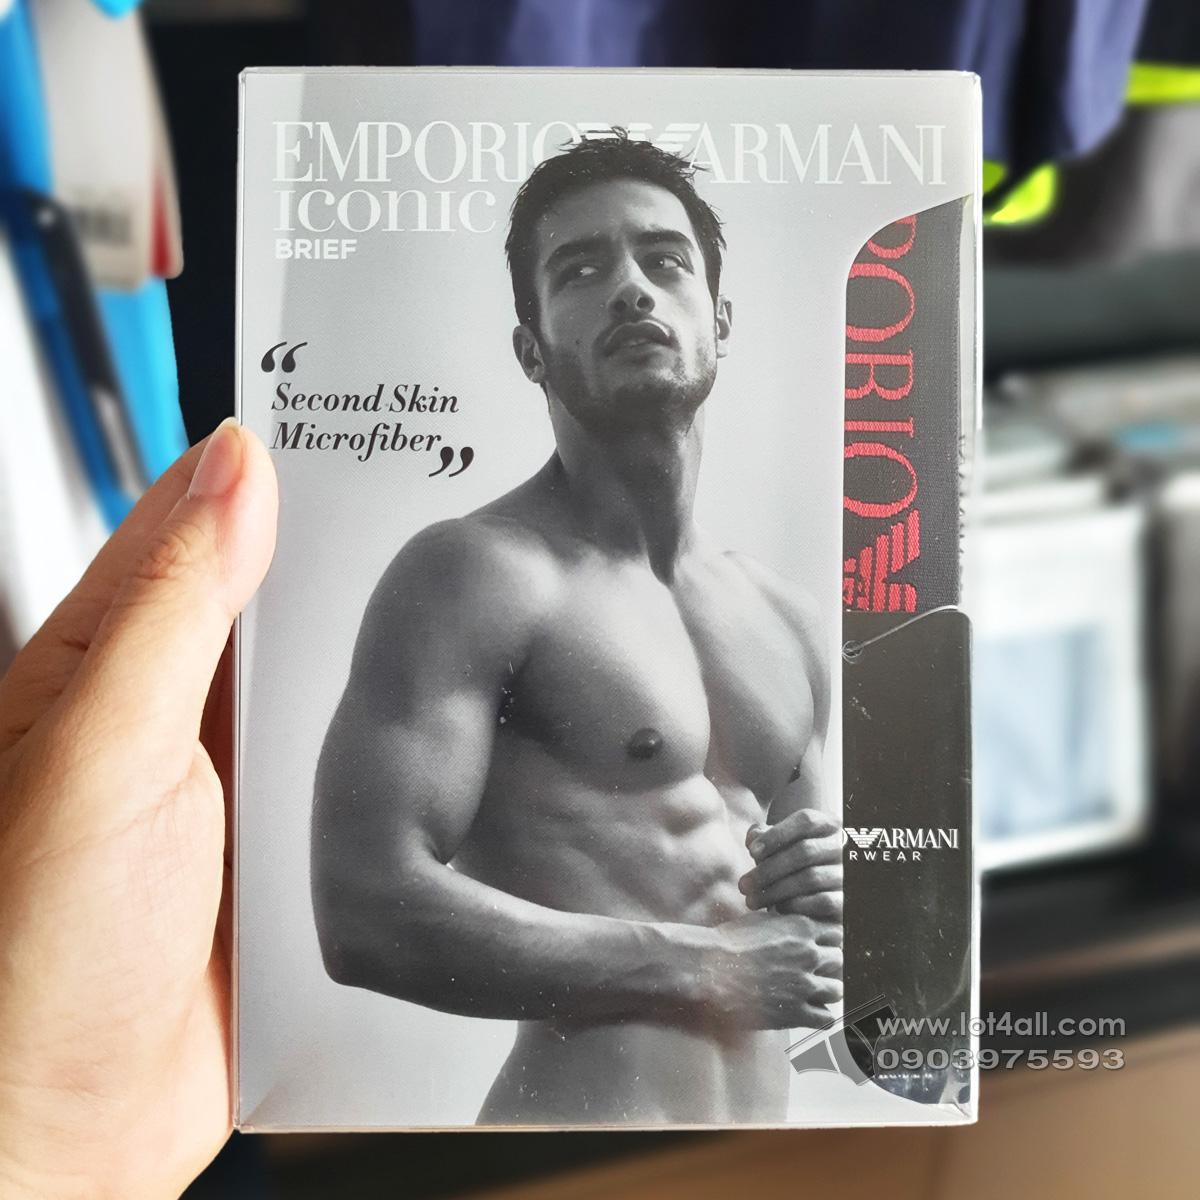 Quần lót nam Emporio Armani Second Skin Microfiber Brief Moon